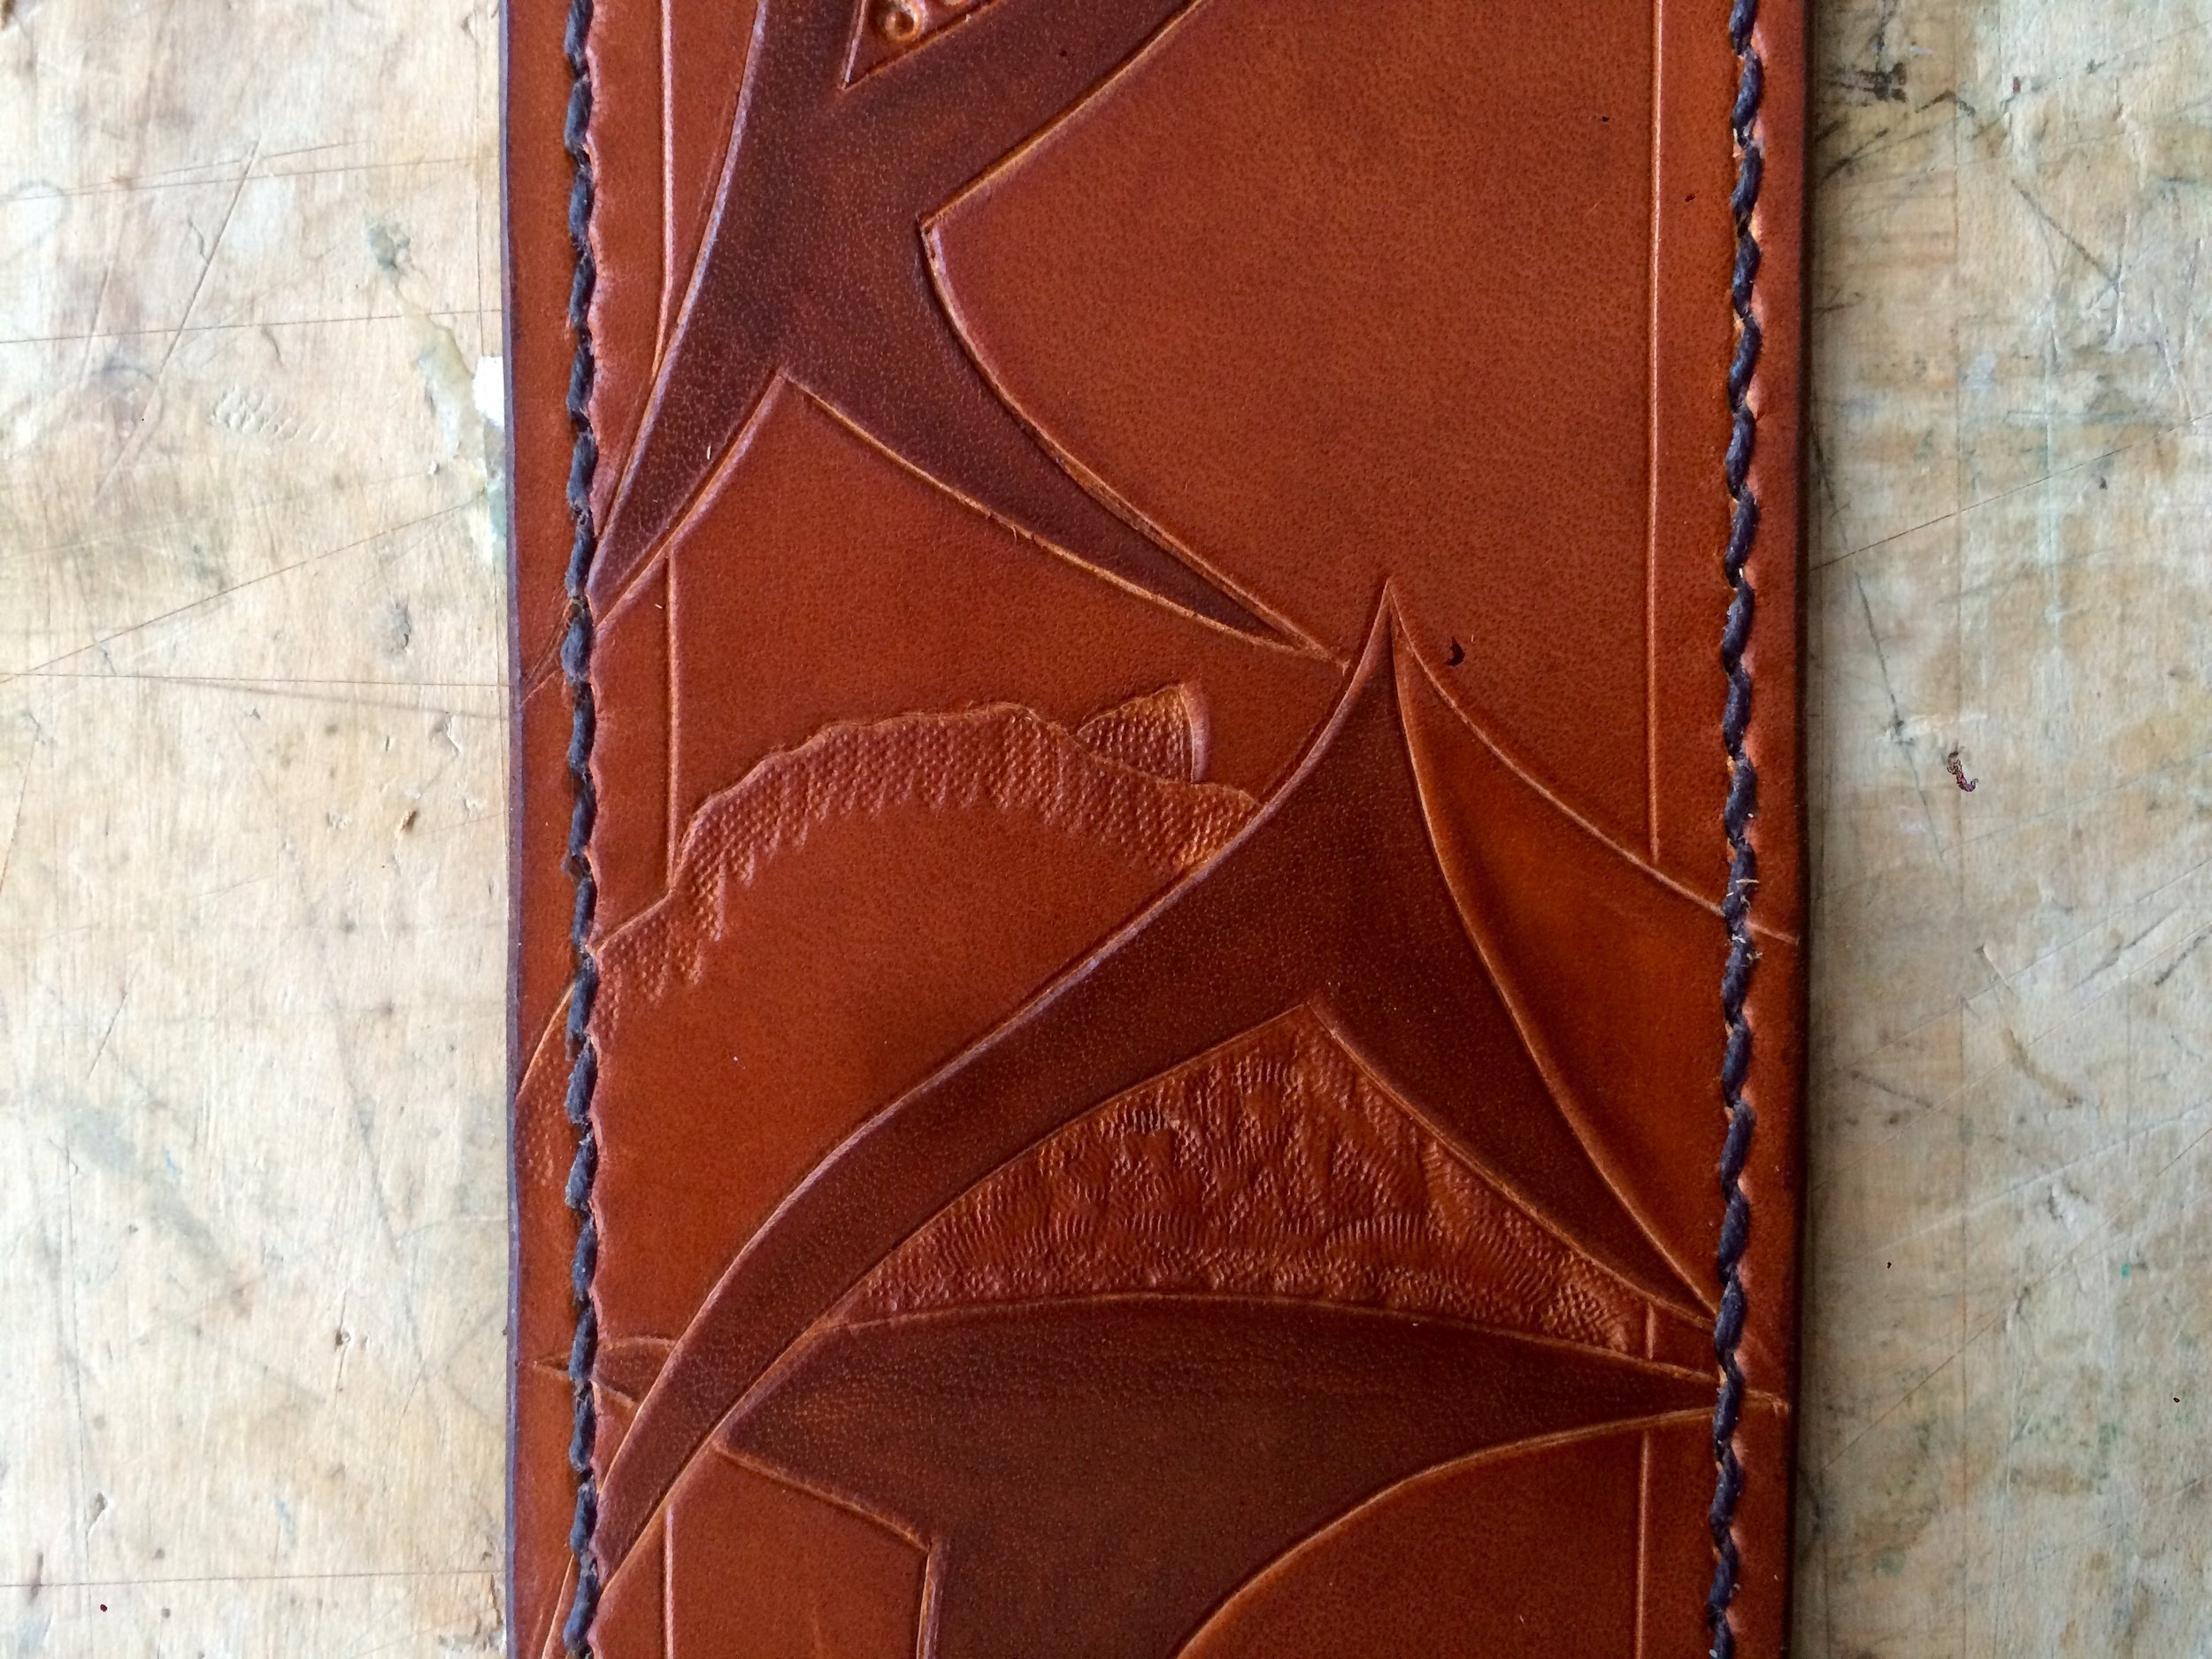 Saddle-stitch shown on custom guitar strap